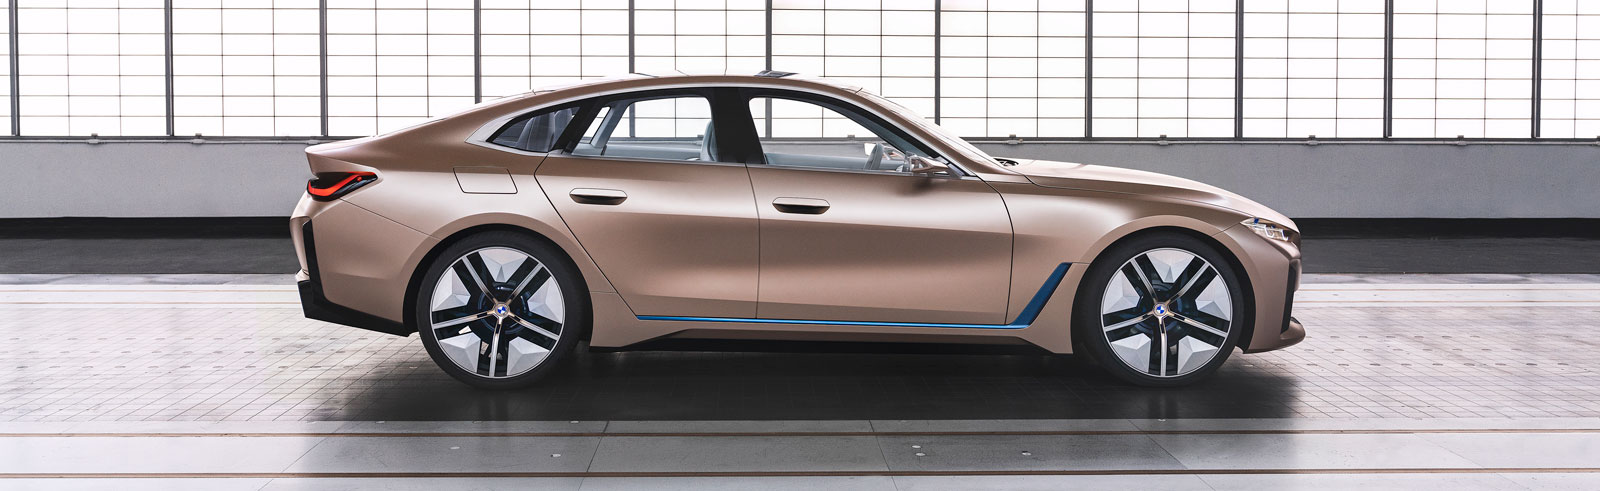 BMW Concept i4 official photos